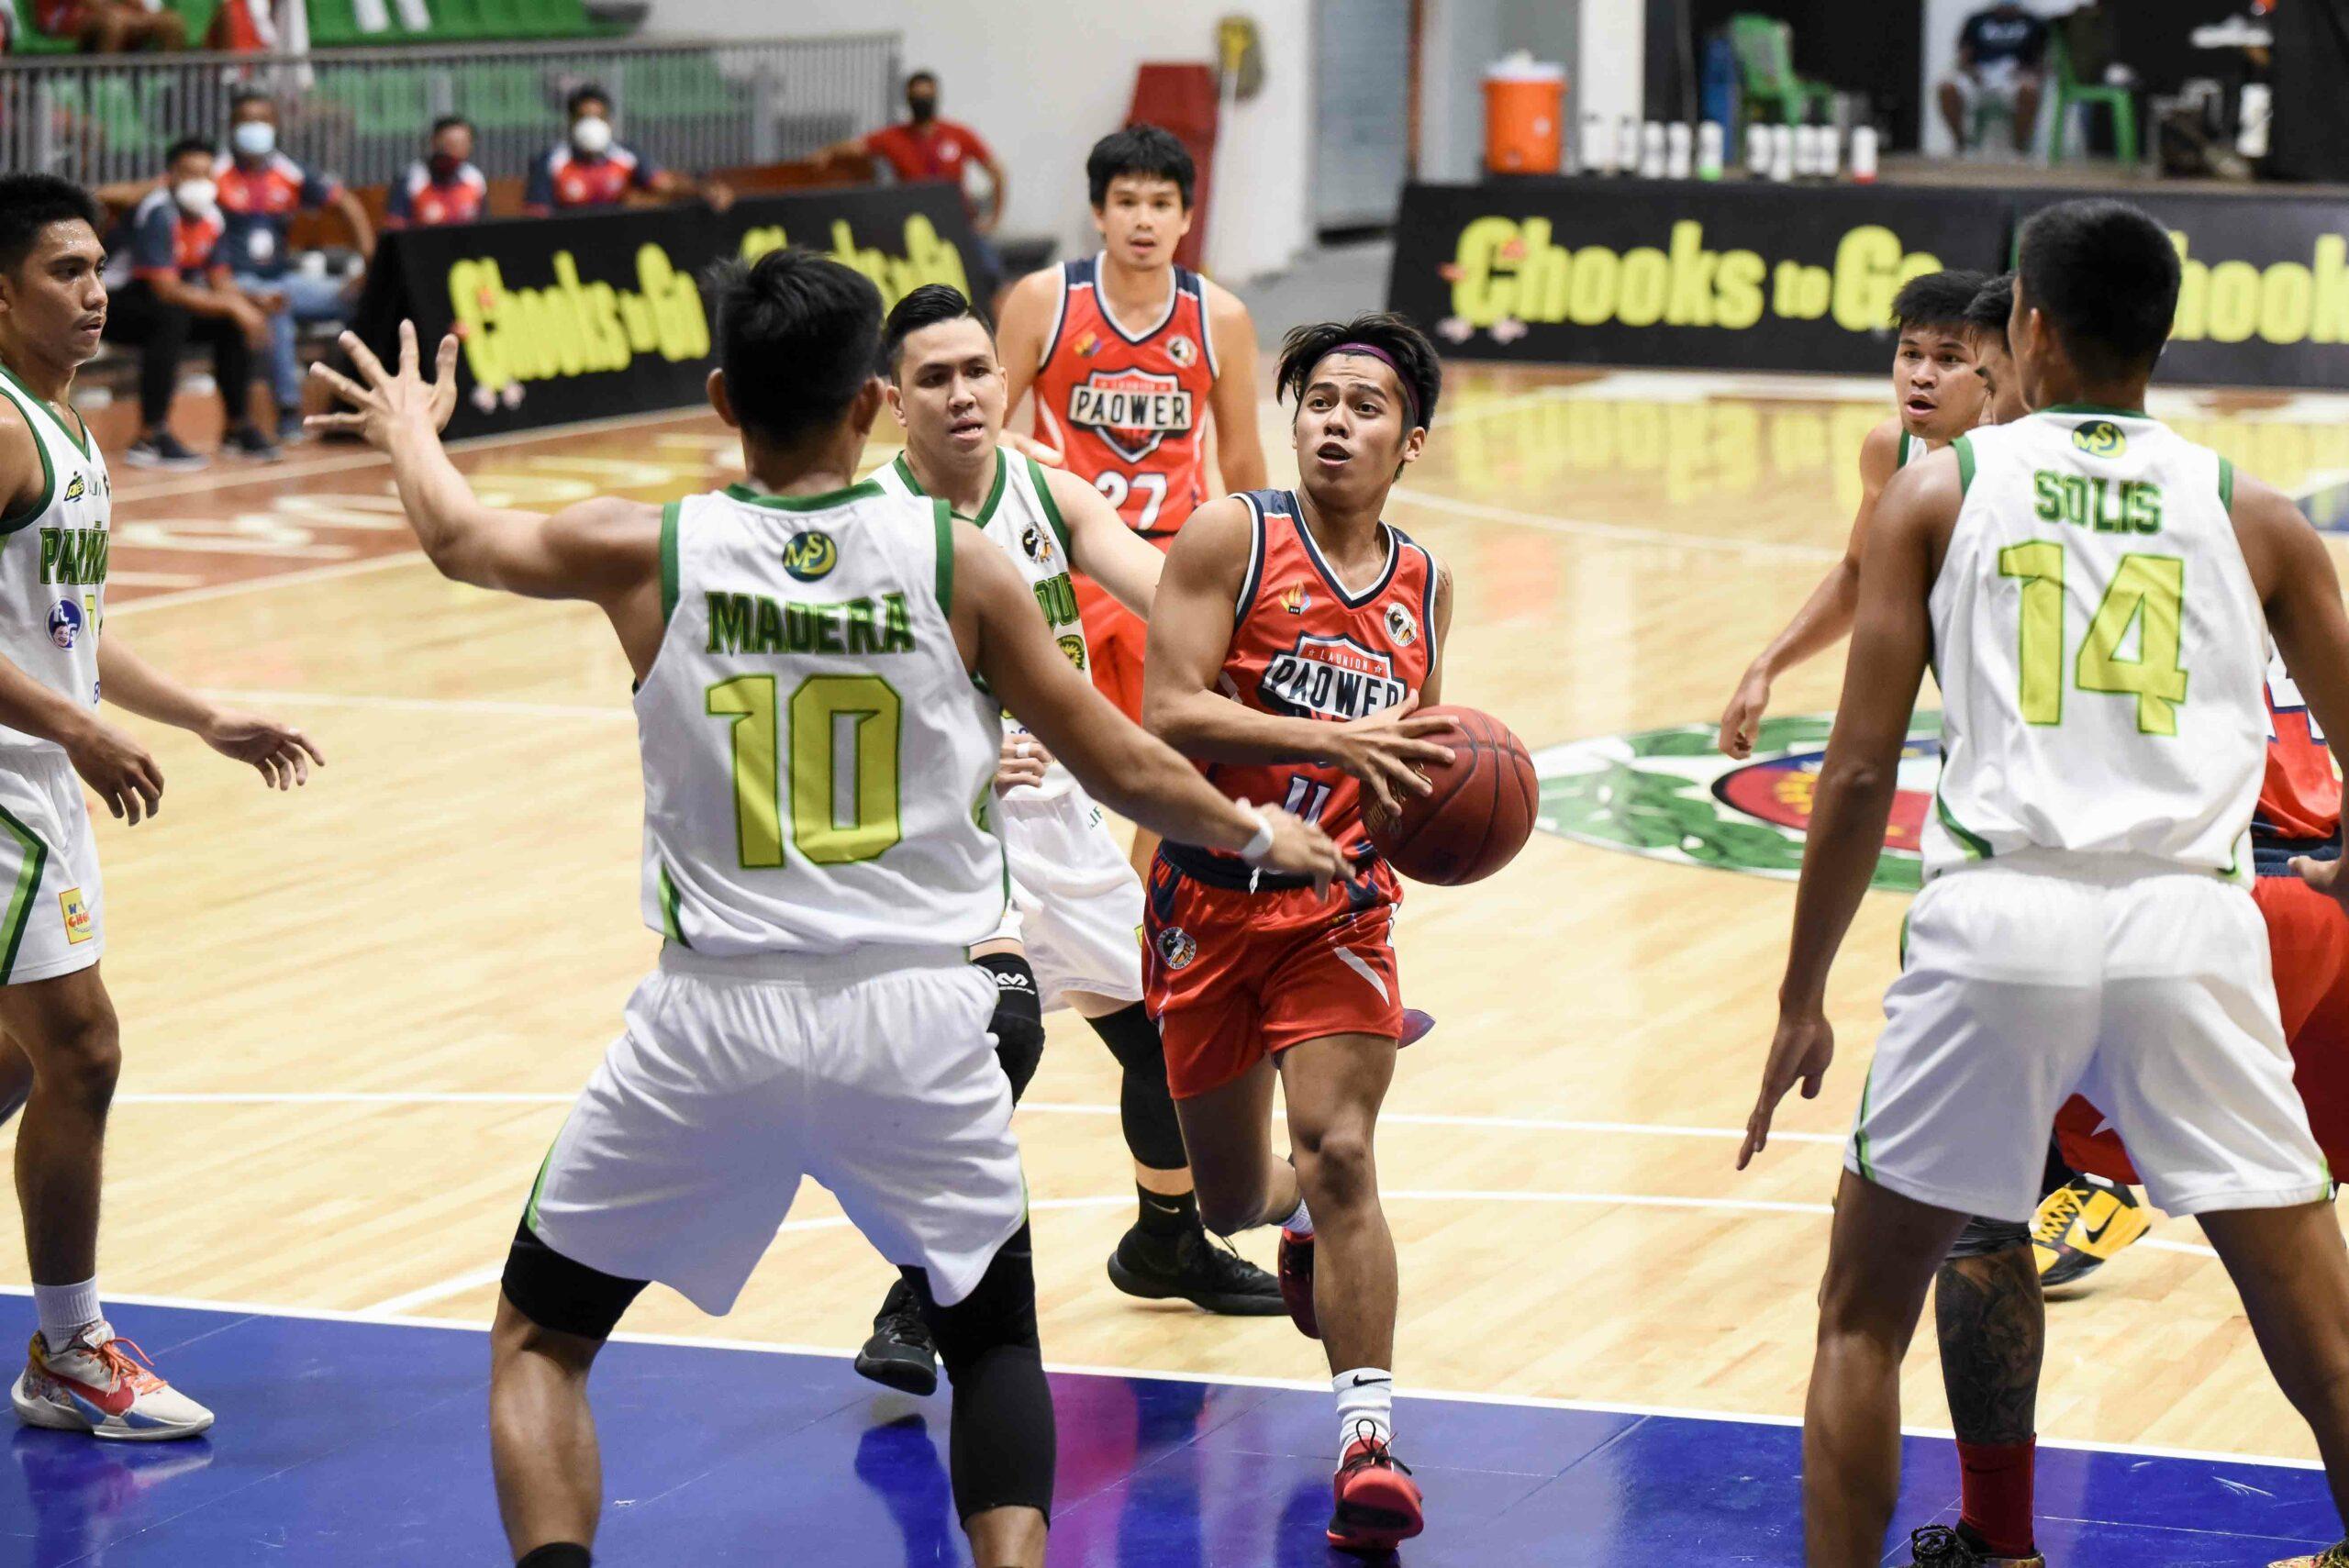 2021-Chooks-NBL-Paranaque-vs-La-Union-Kirk-Agulan-La-Union-scaled Apolonio, Agulan link up as La Union edges Paranaque for share of NBL lead Basketball NBL News  - philippine sports news